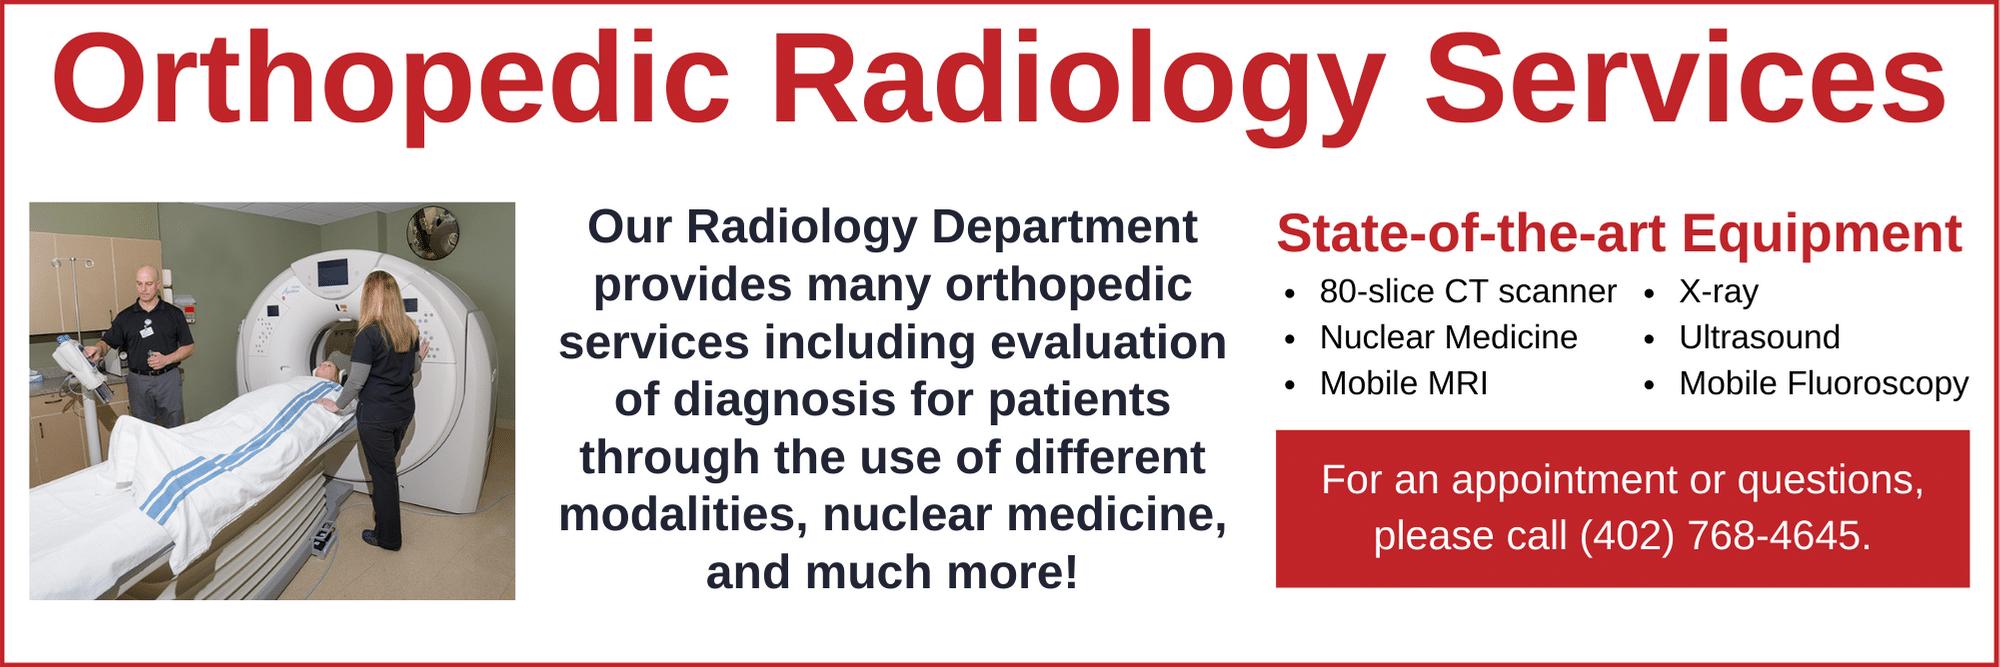 Orthopedic Radiology Services